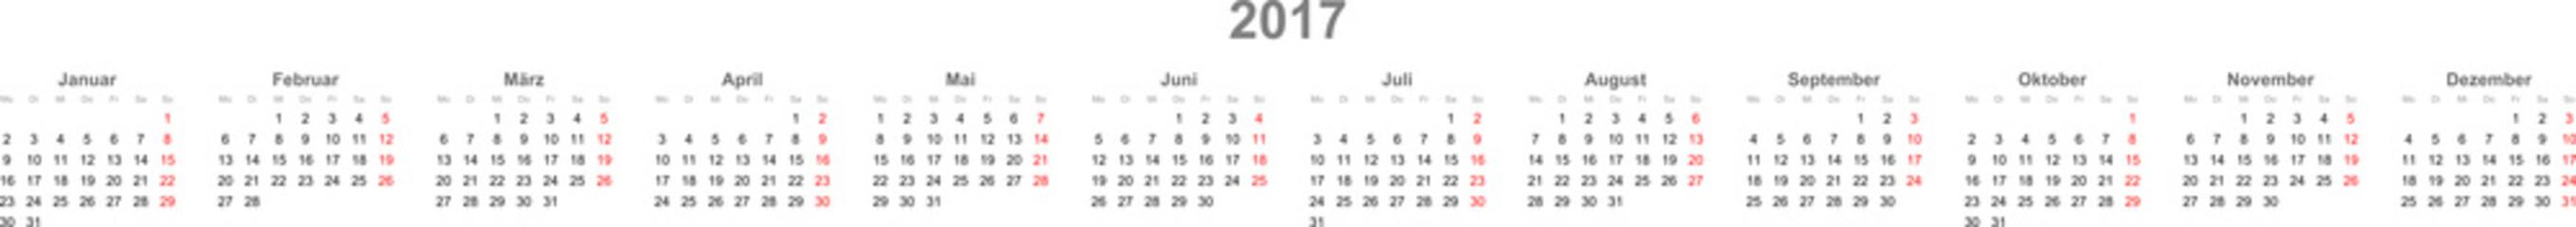 Kalender Zeile 2017